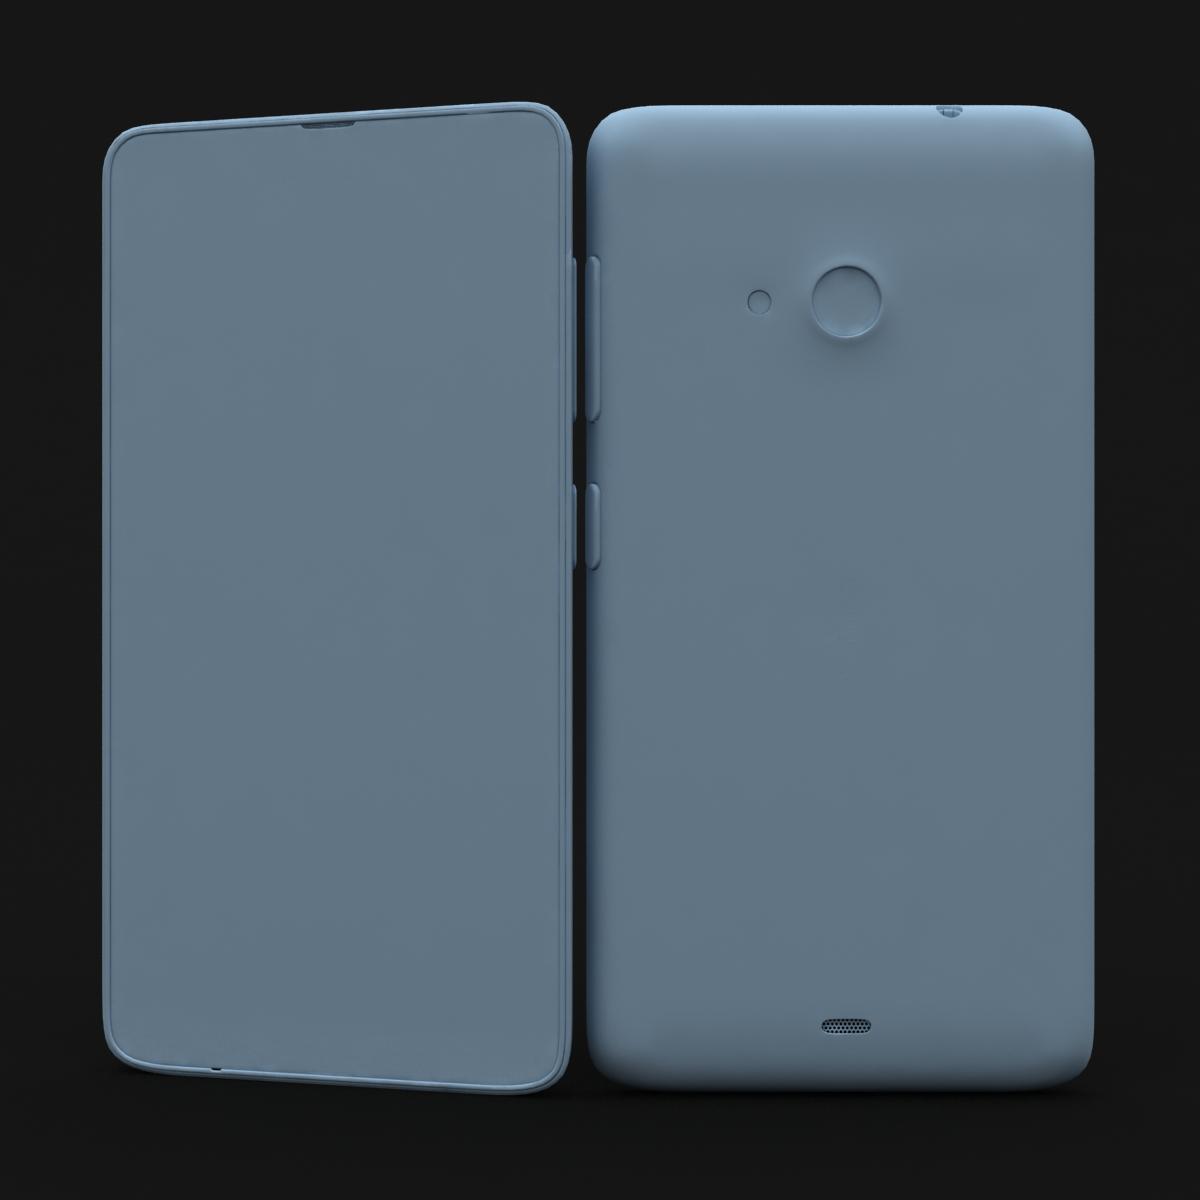 microsoft lumia 535 and dual sim orange 3d model 3ds max fbx c4d obj 204126